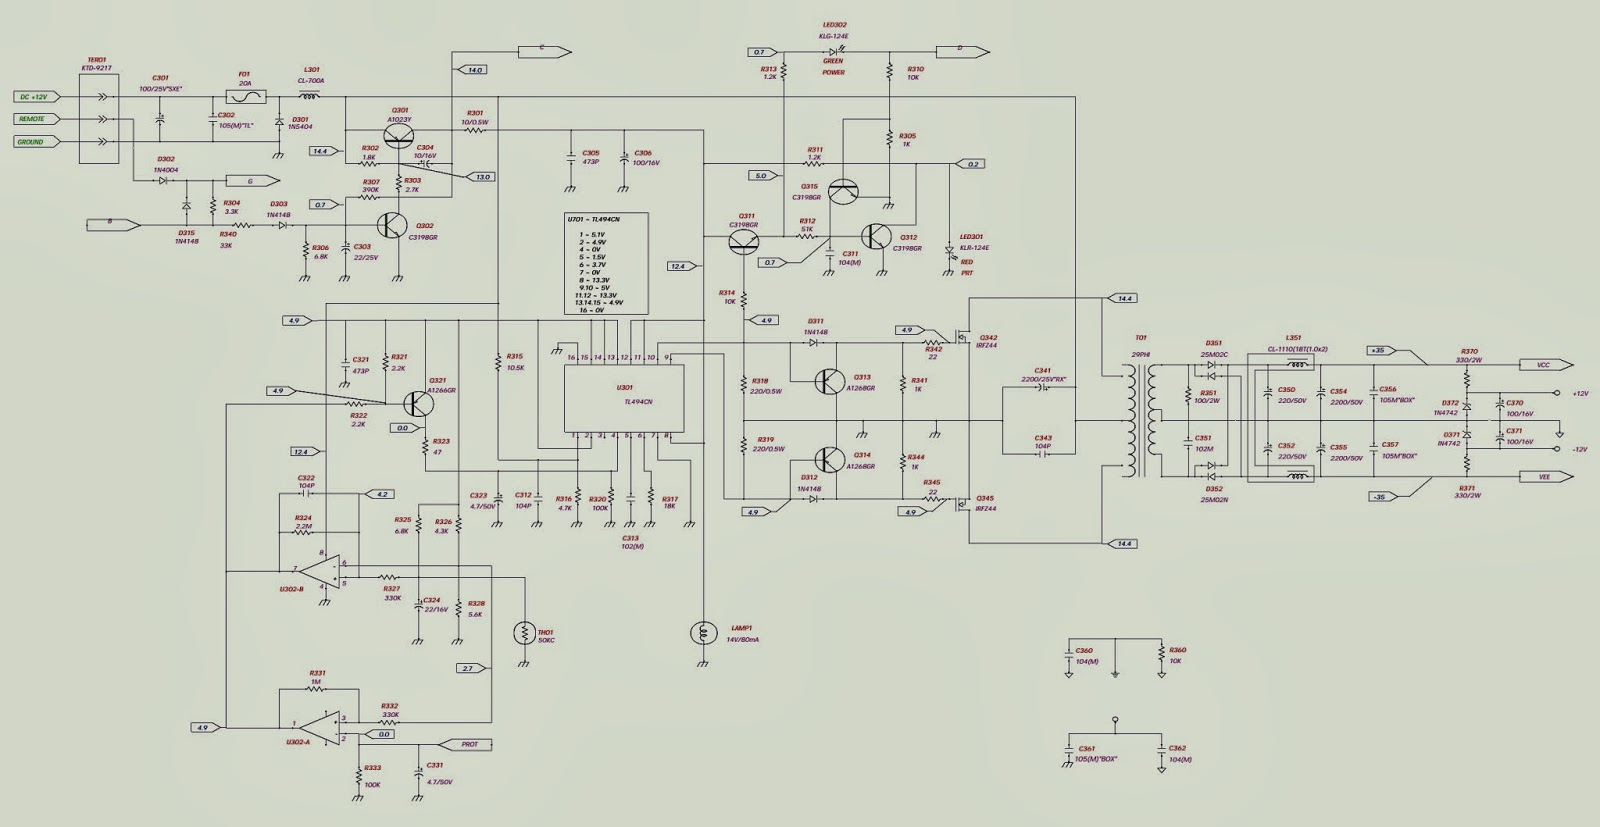 Jbl Bp1501 1 Channel Power Amplifier Schematic Circuit Diagram 1channel Amp Wiring